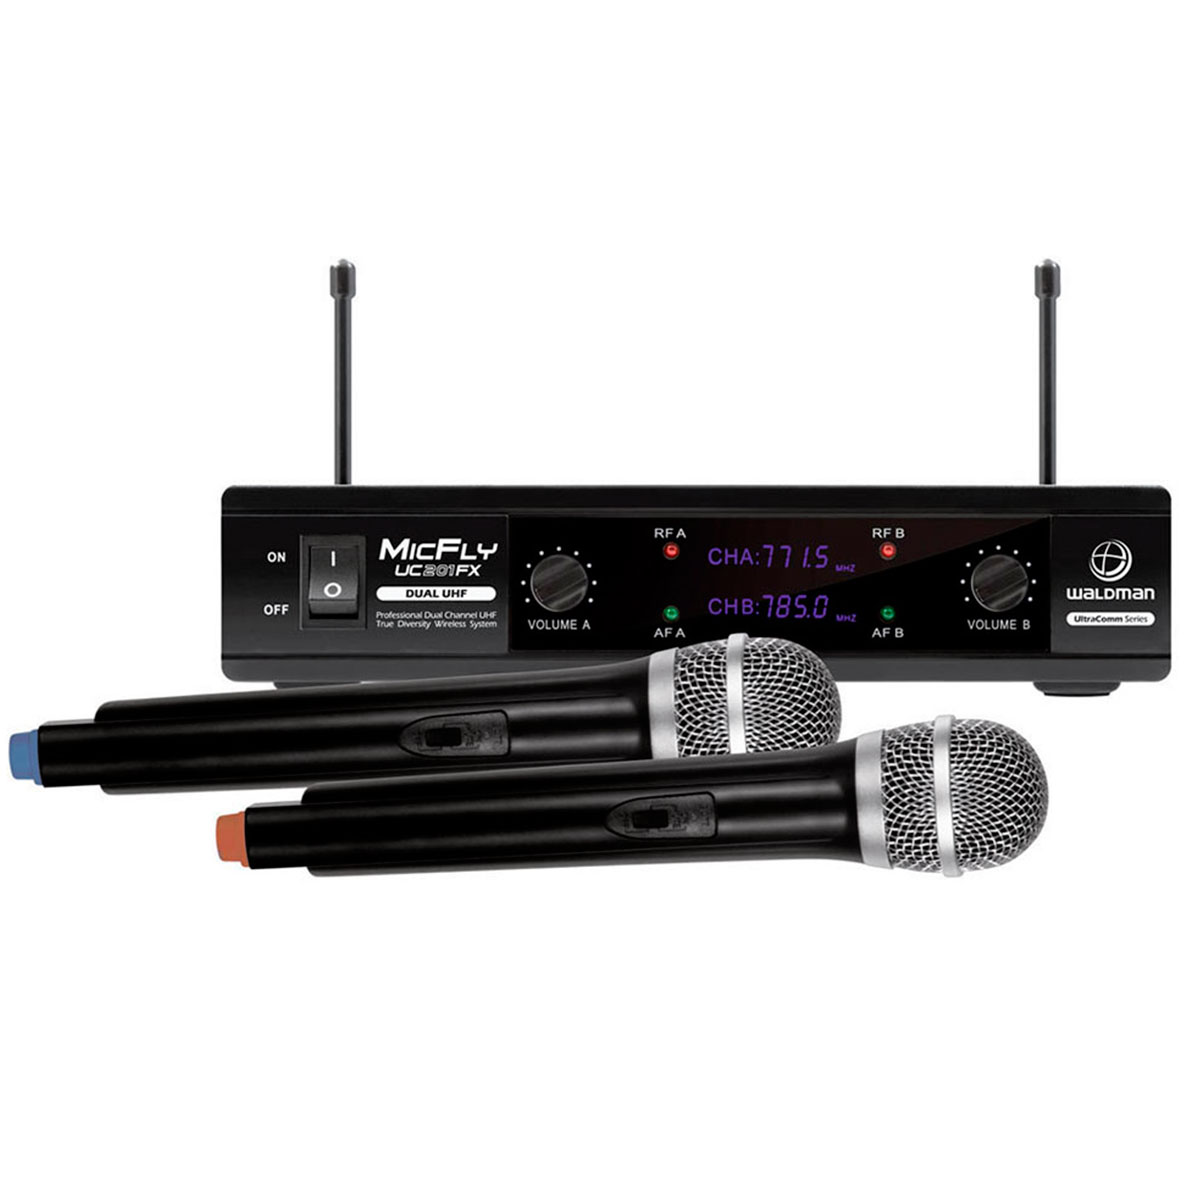 UC201FX - Microfone s/ Fio de M�o Duplo MicFly UC 201 FX - Waldman